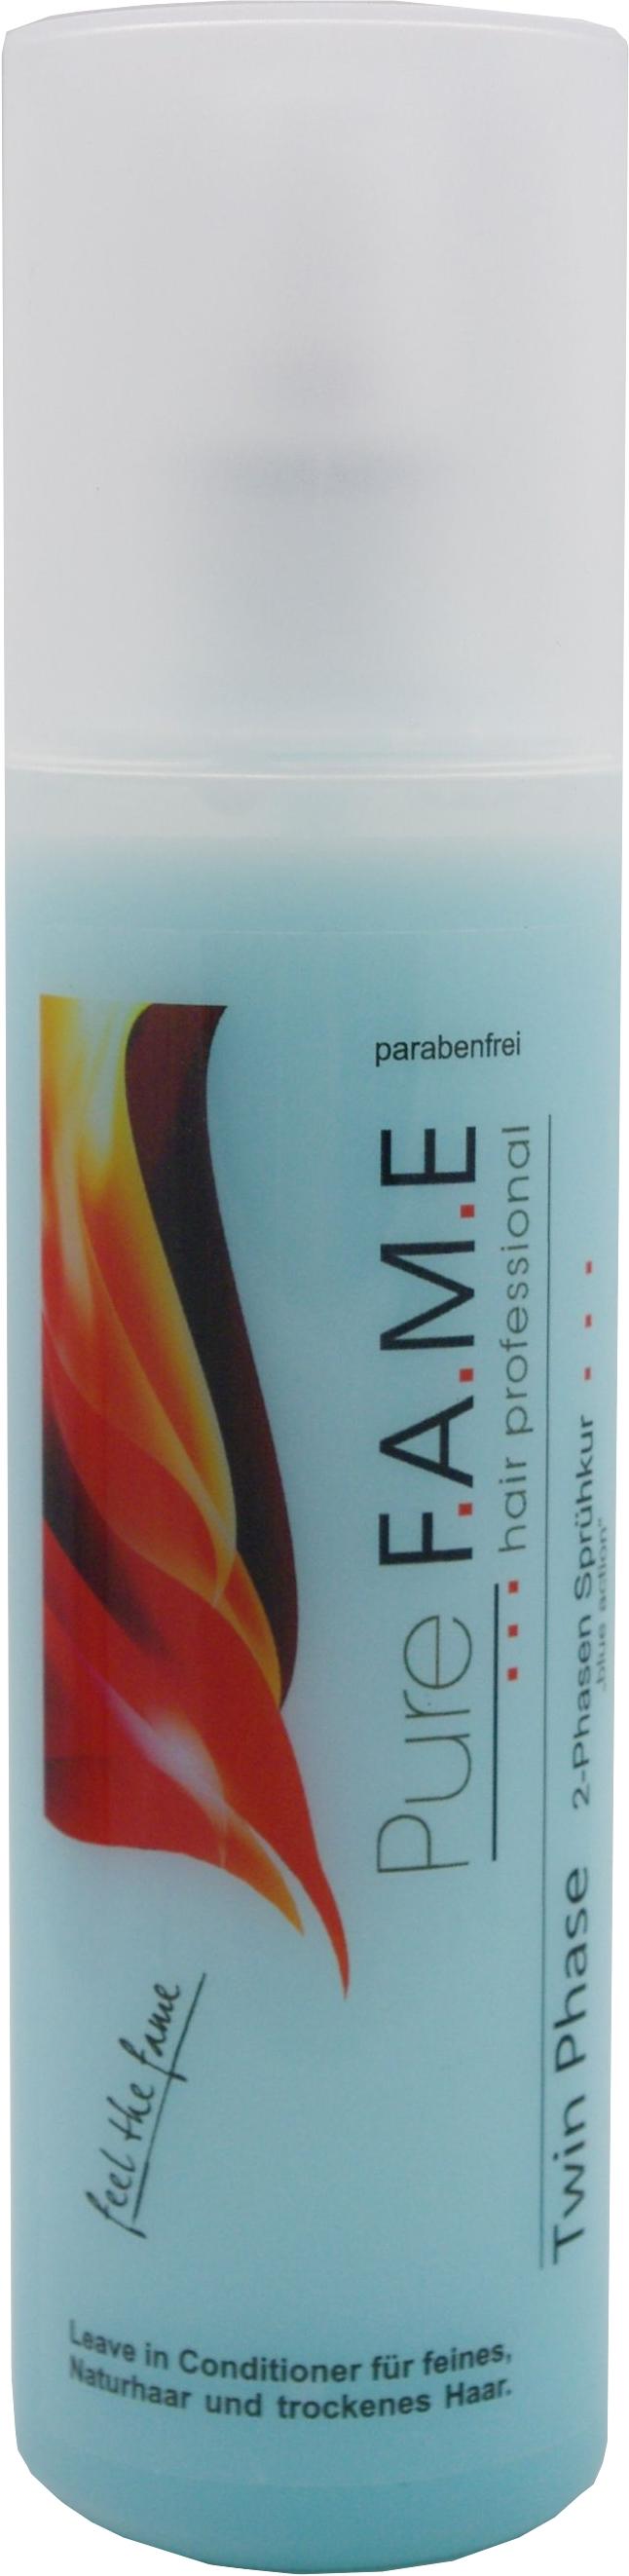 PURE FAME Twin Phase 2-Phasen Sprühkur blue action 200 ml